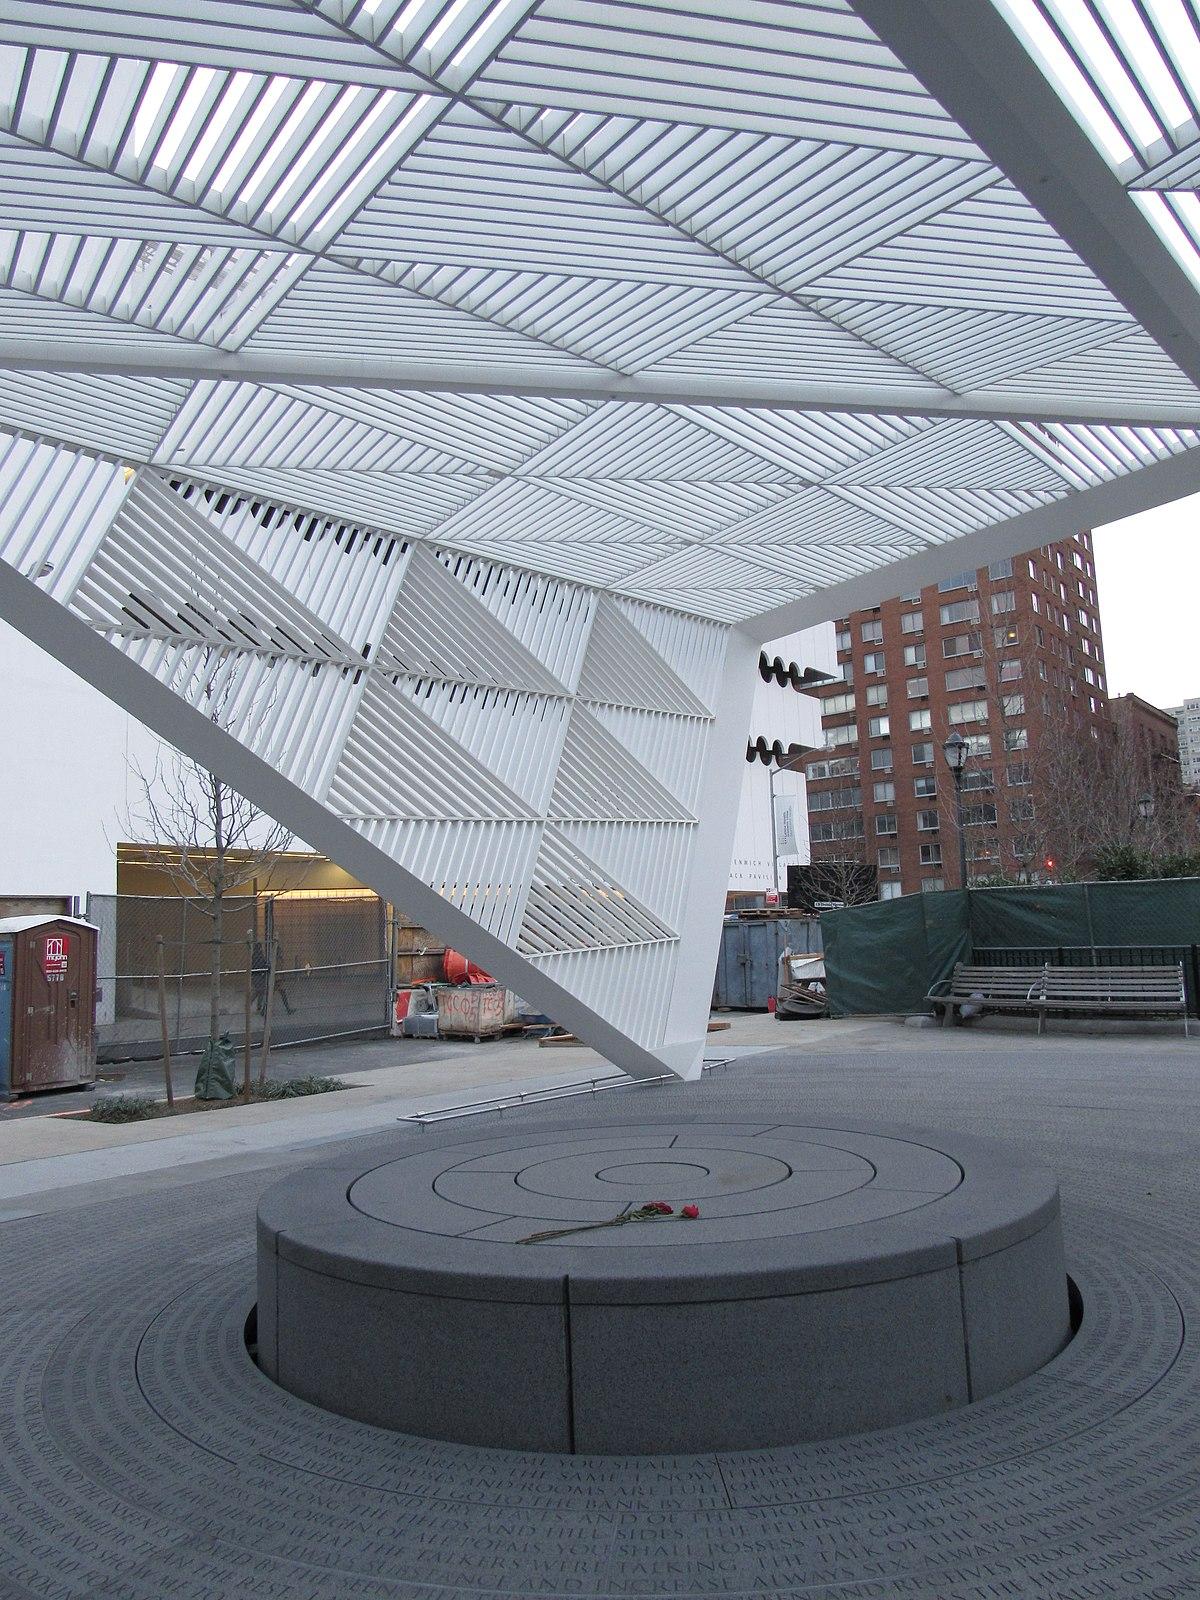 New York City AIDS Memorial - Wikipedia